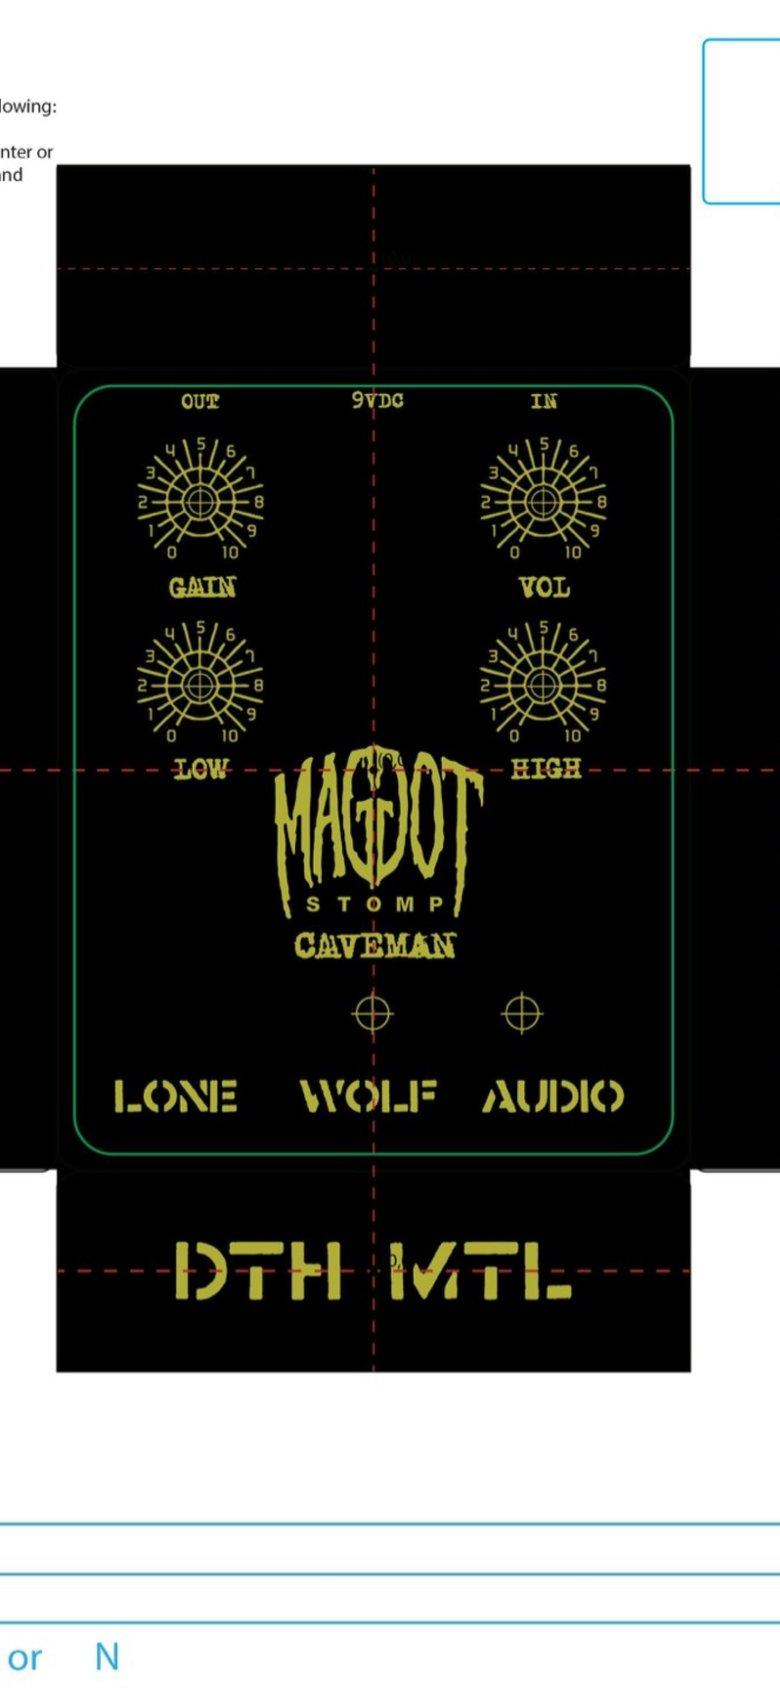 Image of LWA X Maggot Stomp Caveman pre sale